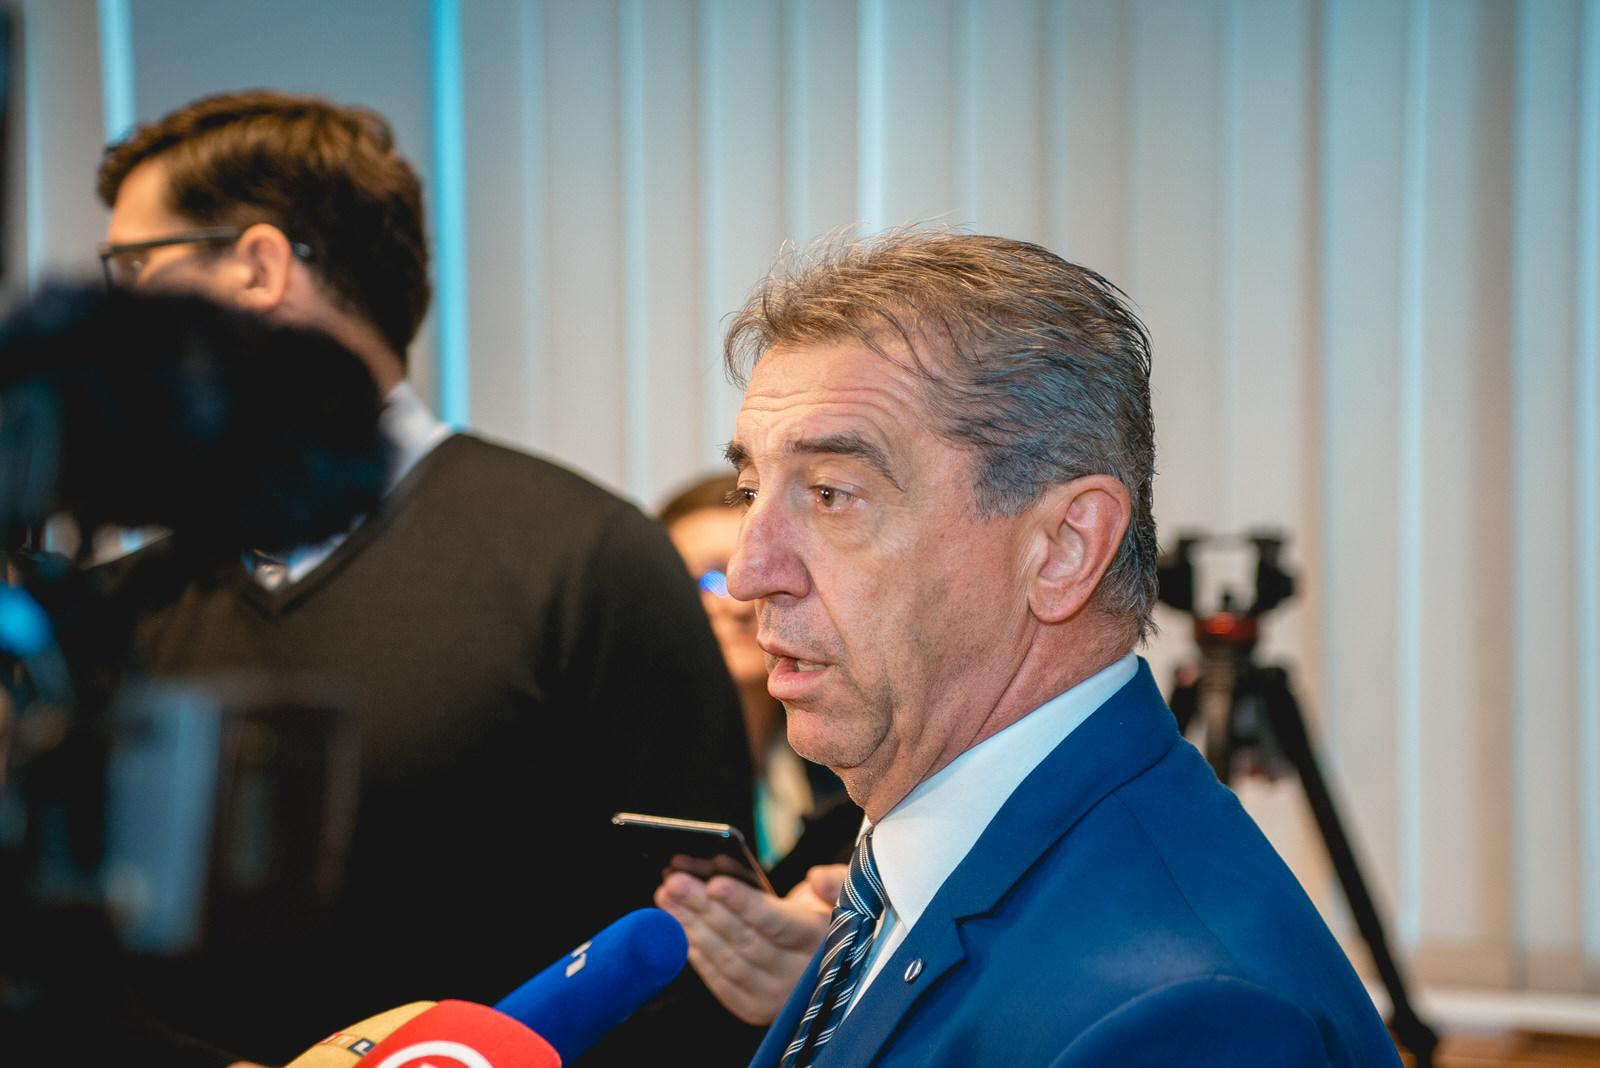 likaclub_gospić_skupština_travanj-2019-31